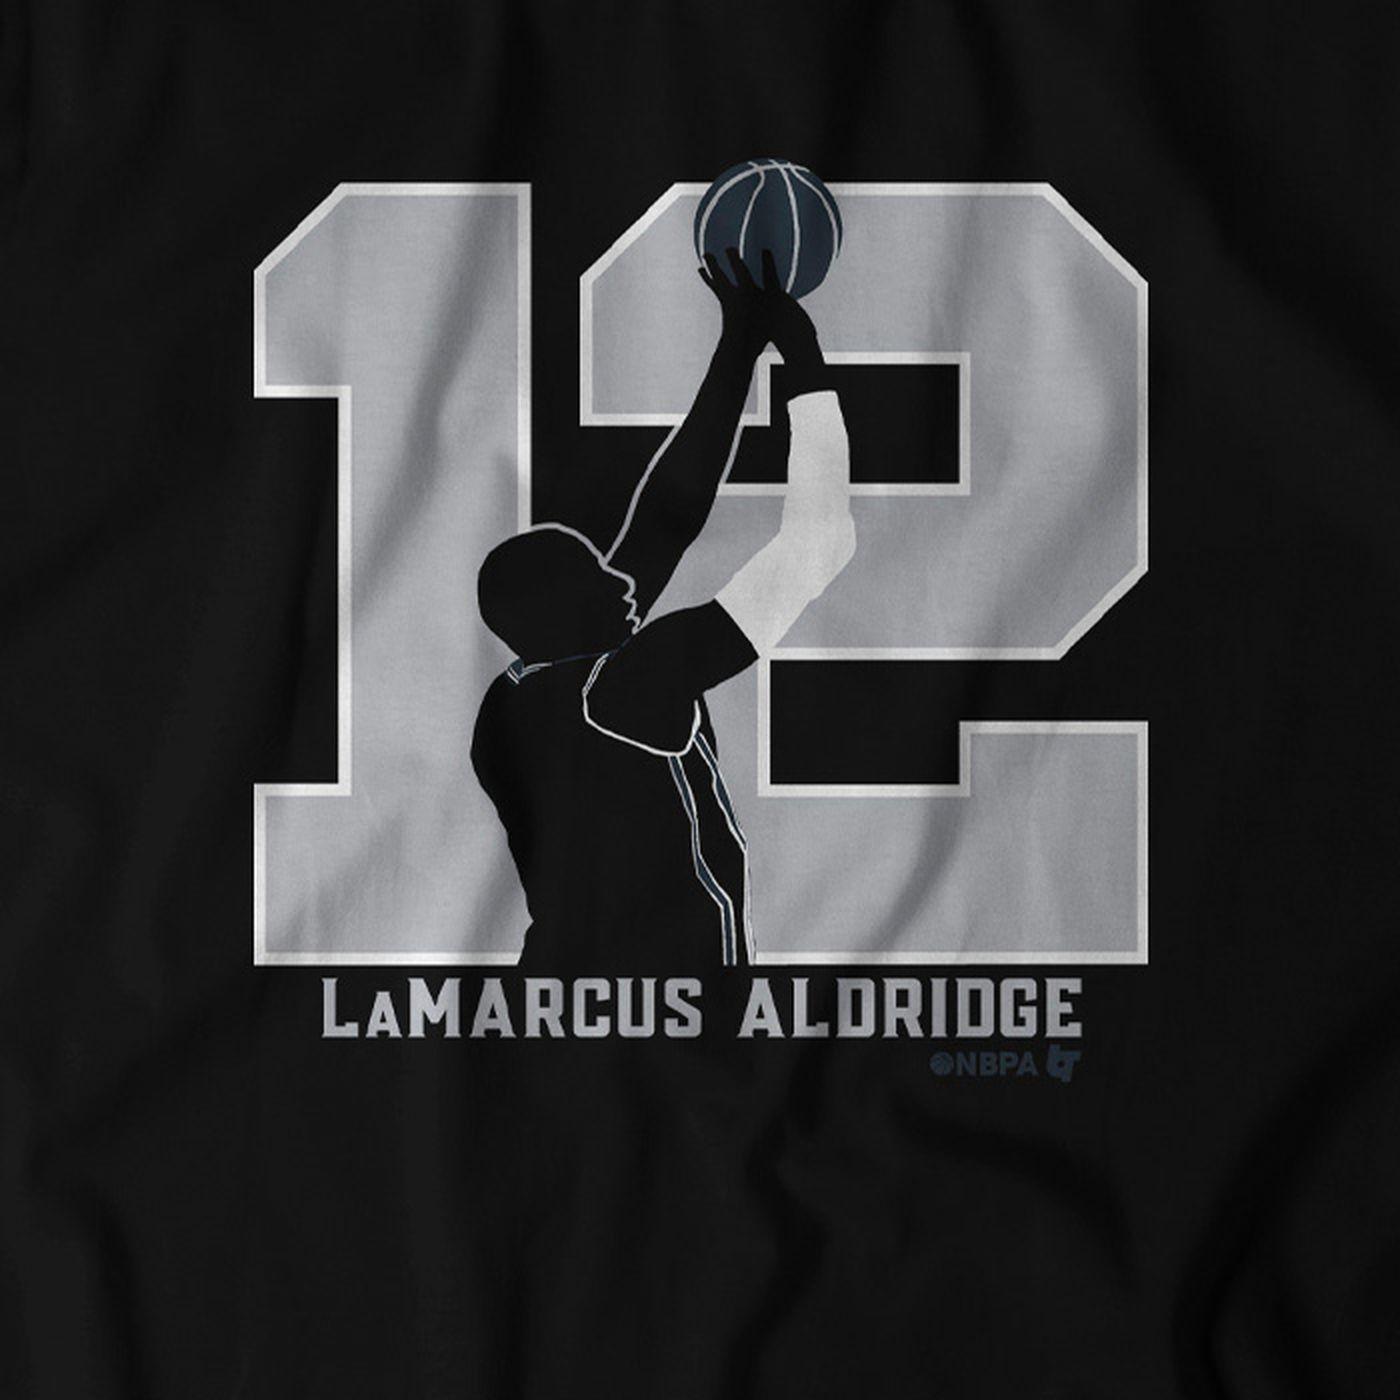 newest 9b6e0 bb84b Releasing the LaMarcus Aldridge T-shirt - Pounding The Rock